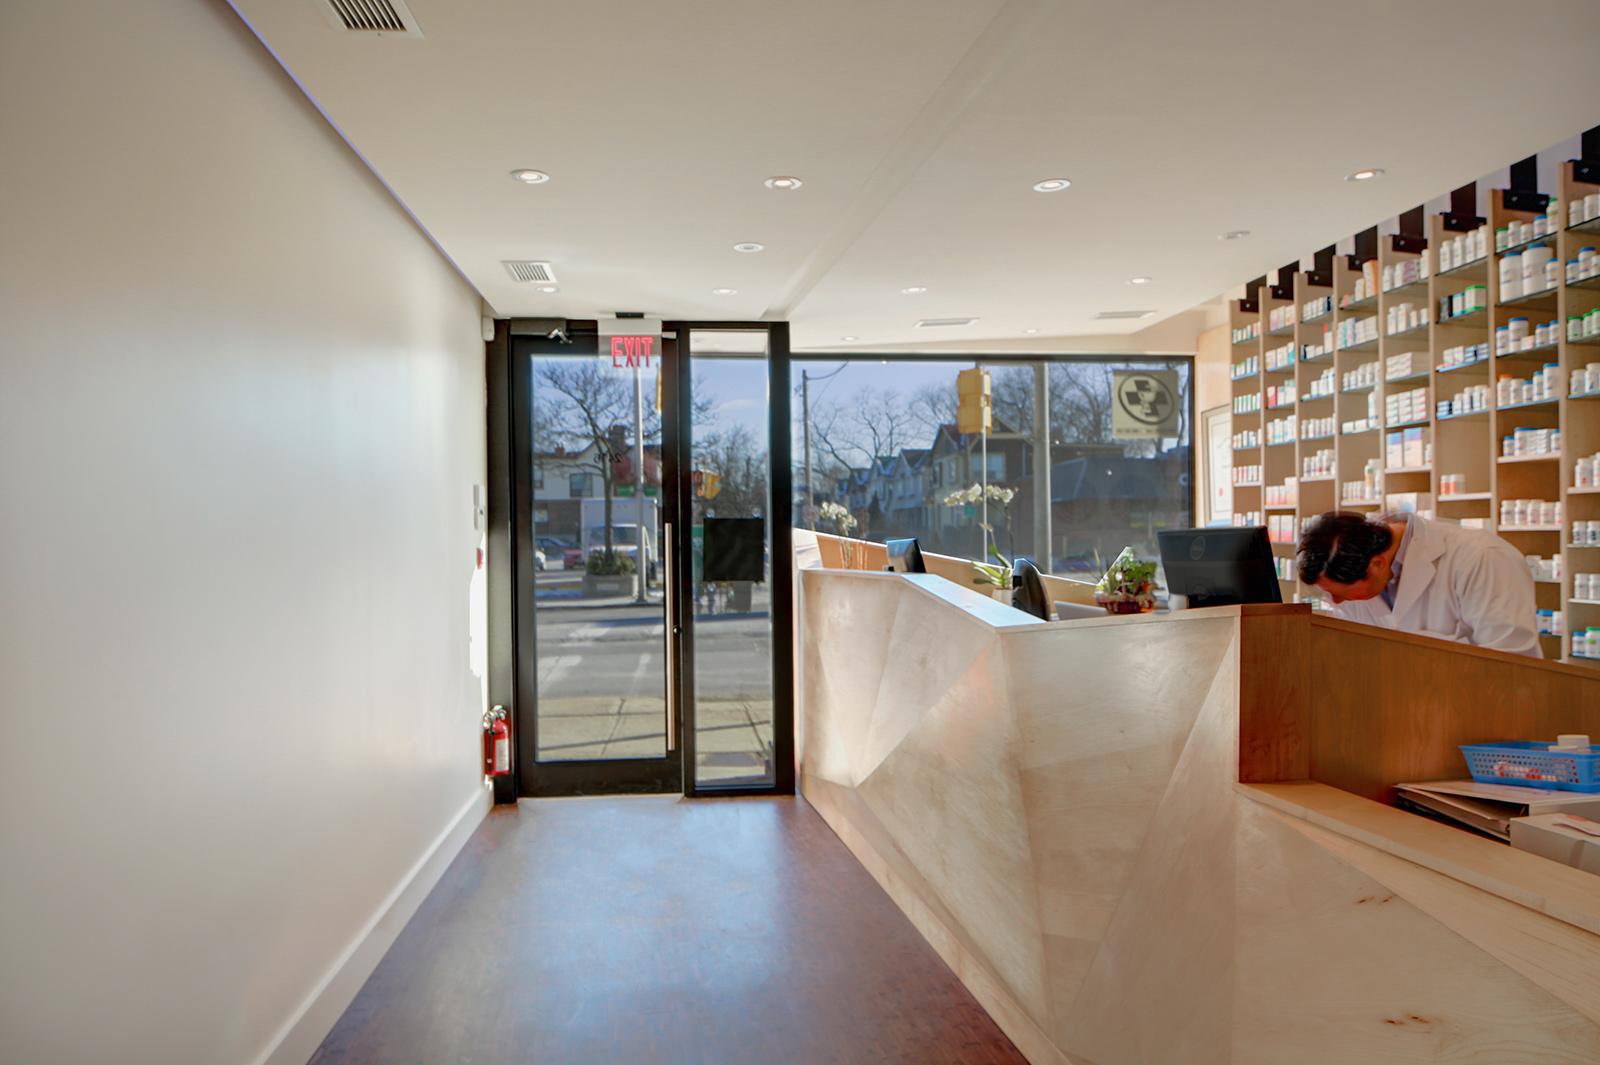 00-Danforth-pharmacy-1.jpg